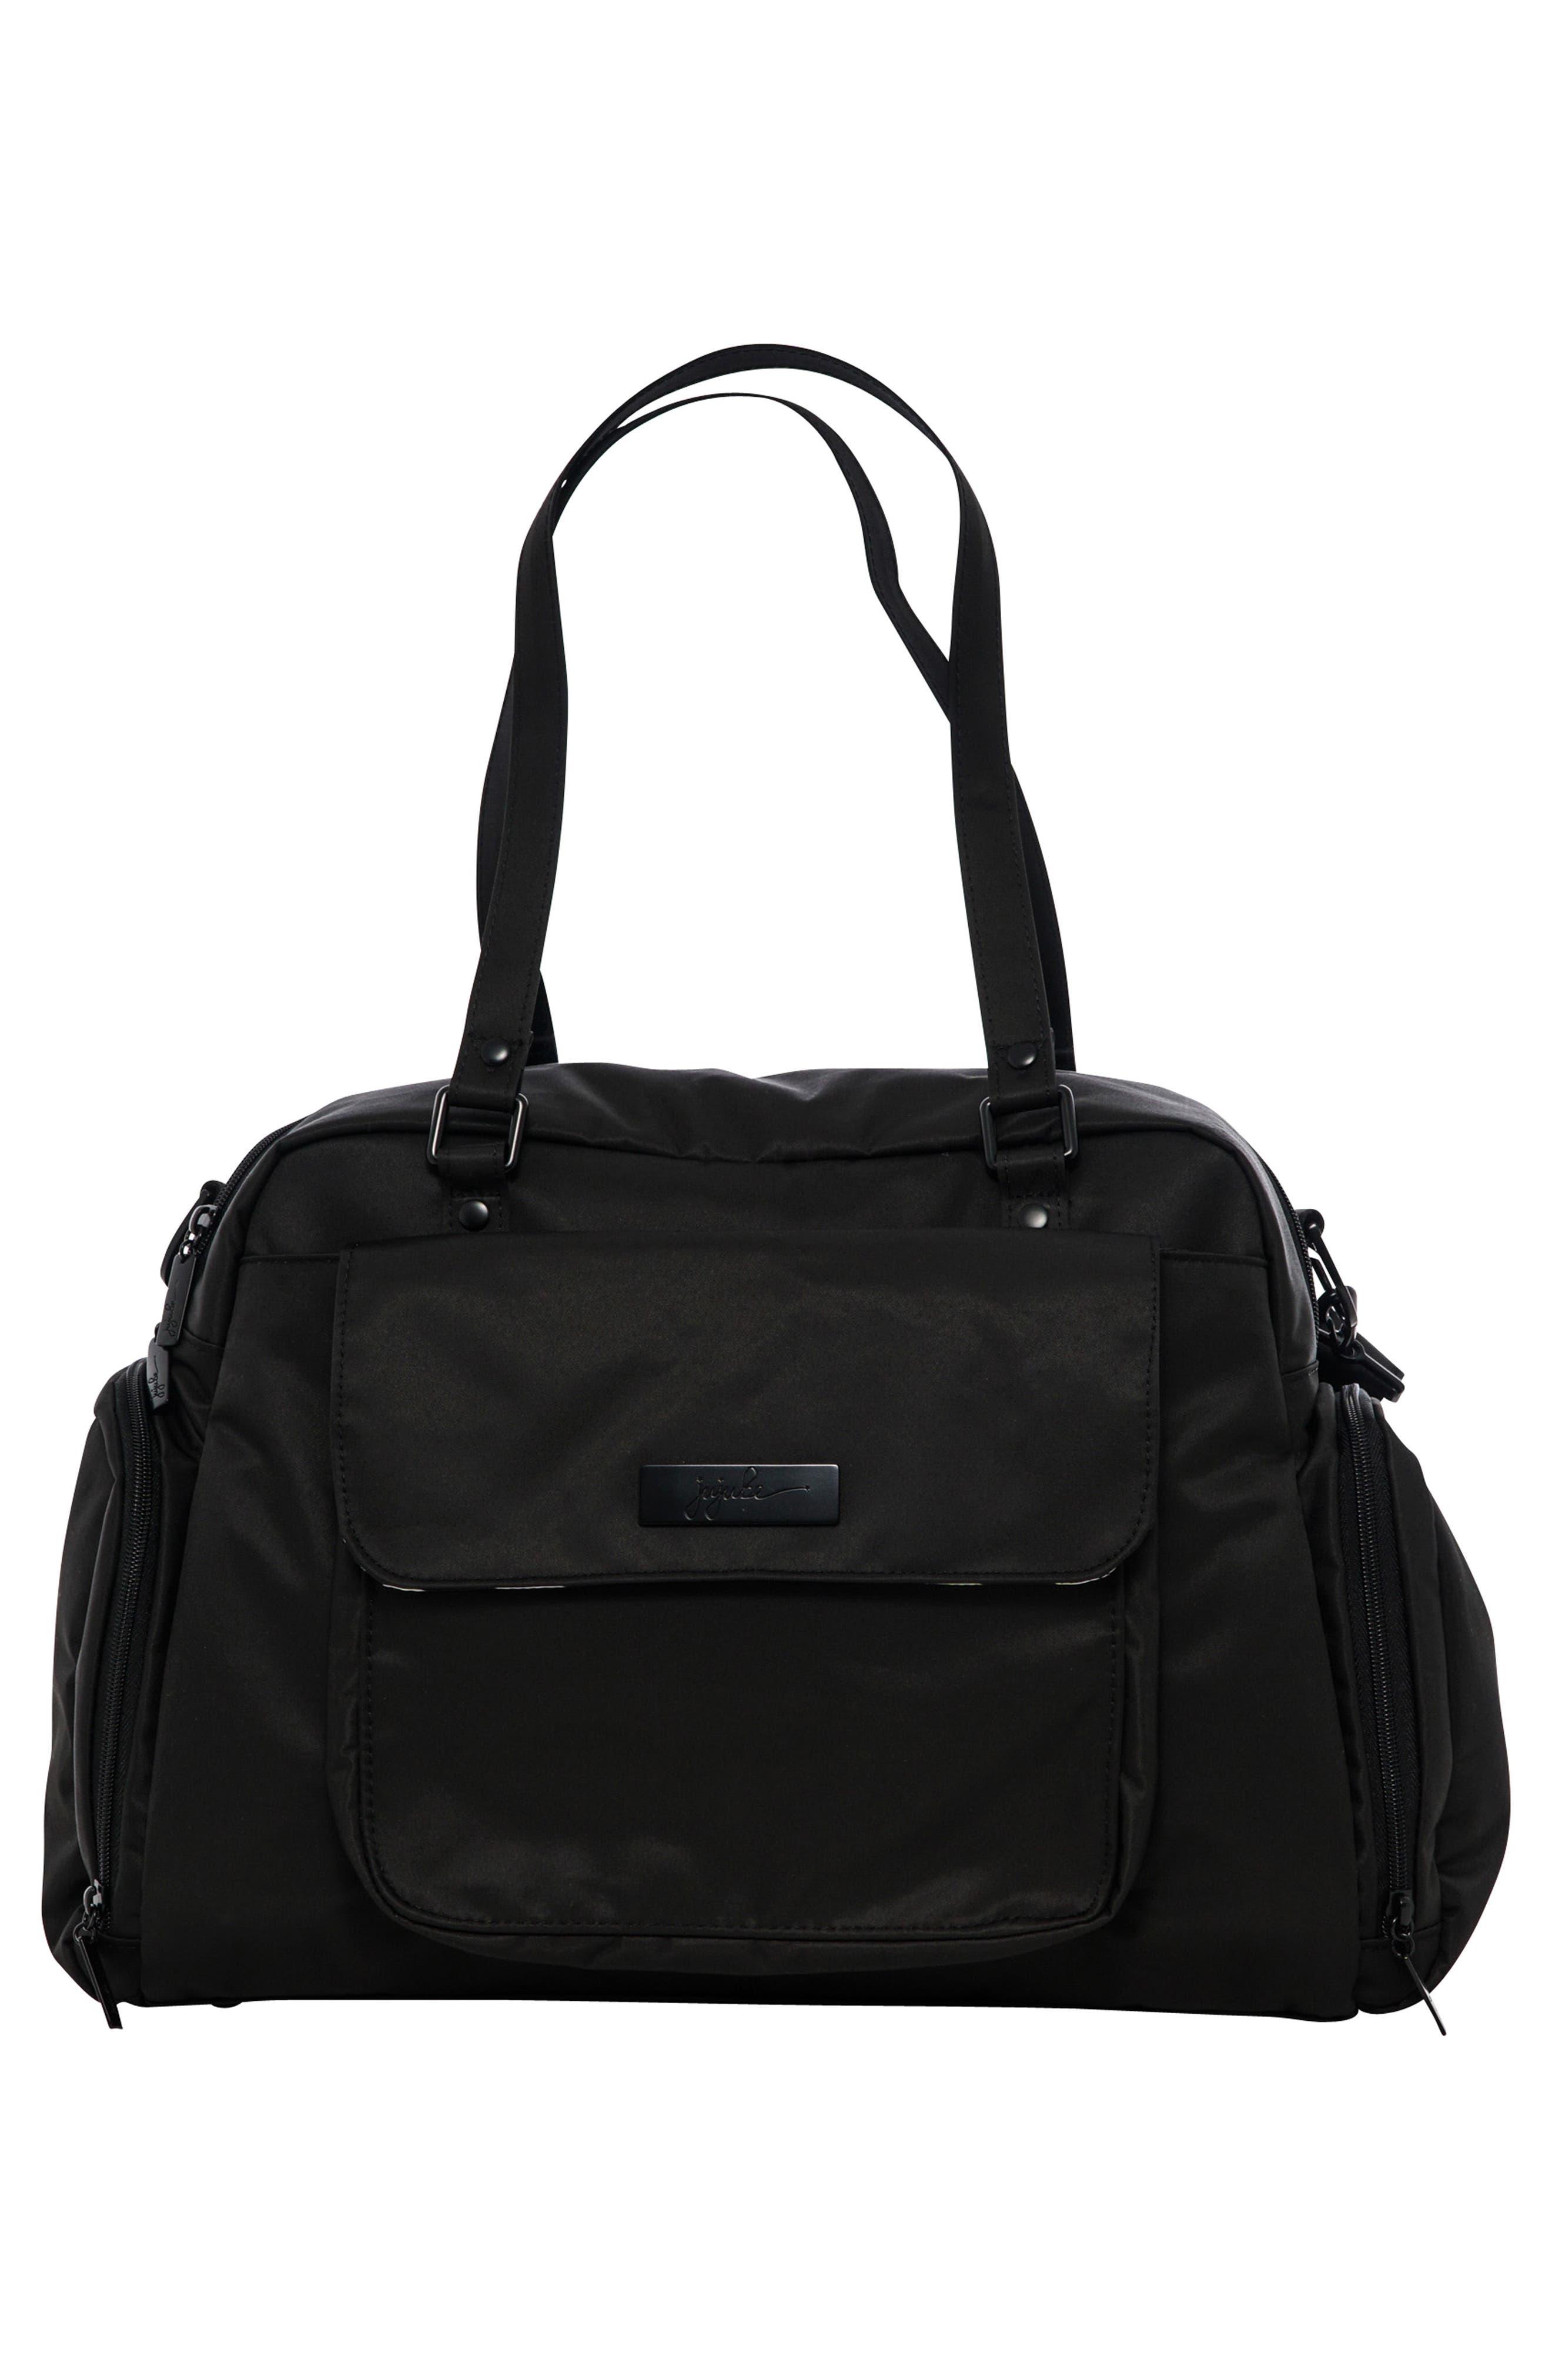 Onyx Be Pumped Bag,                             Alternate thumbnail 4, color,                             Black Out